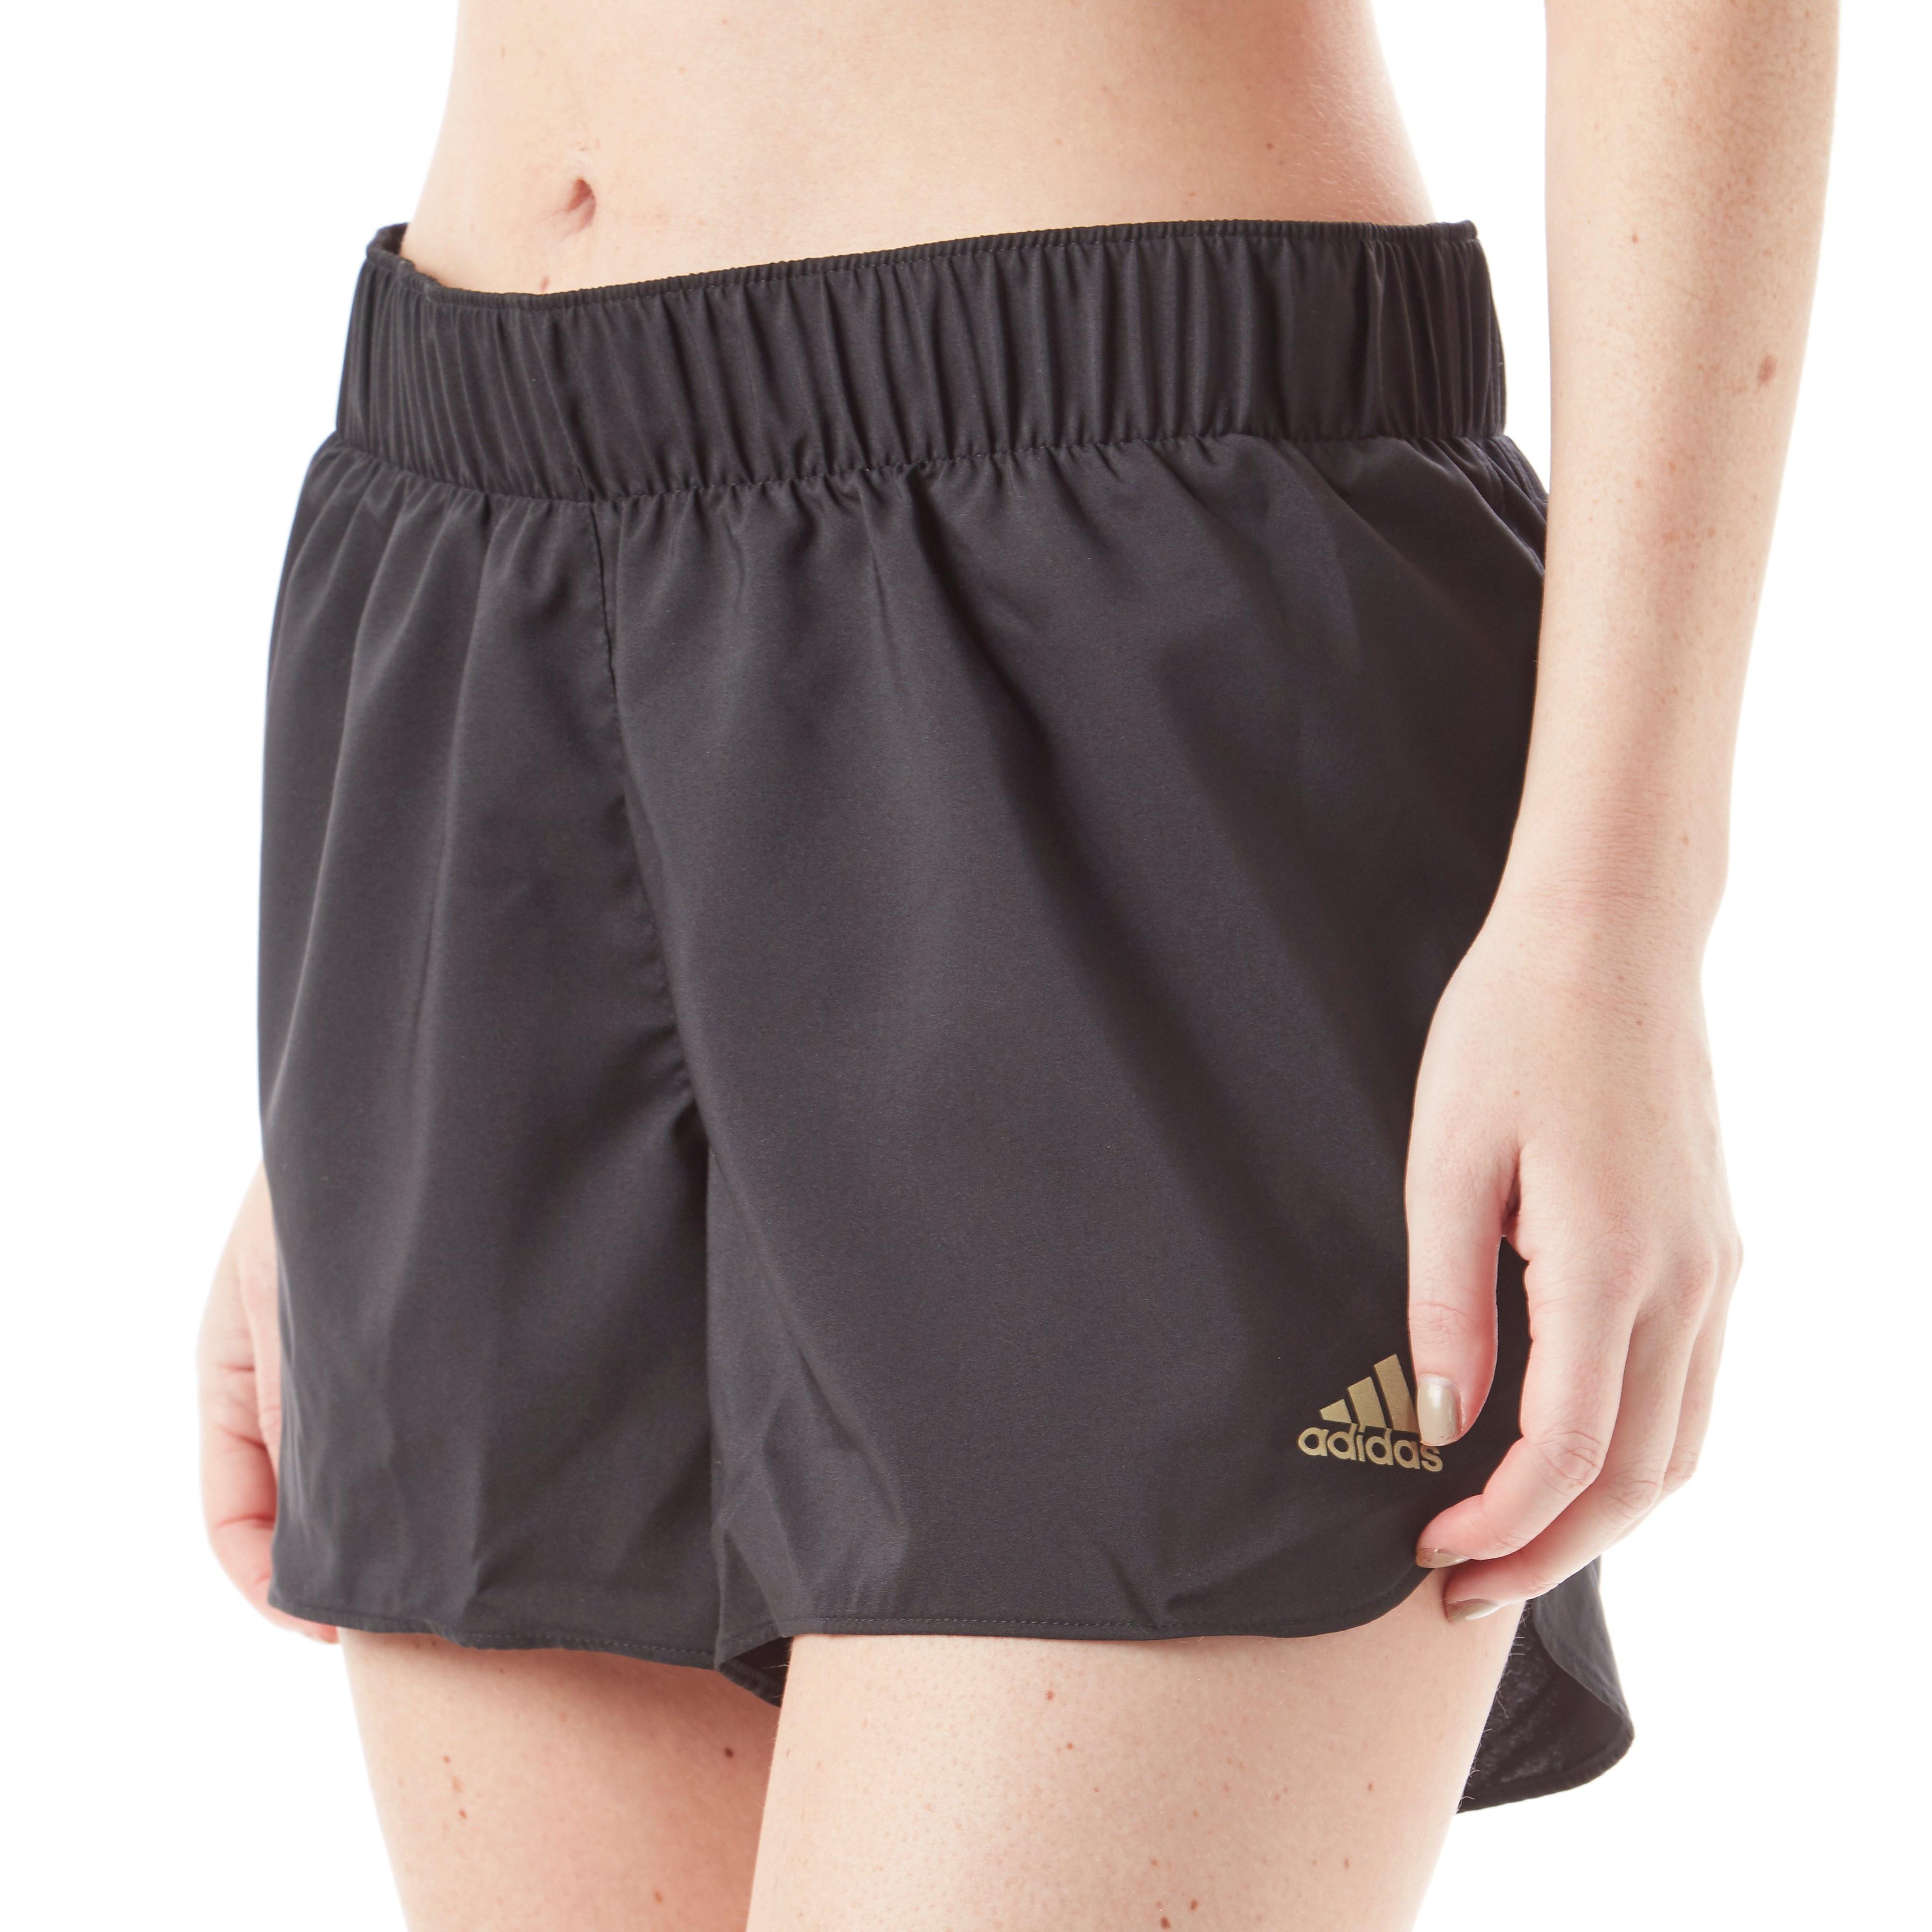 adidas Response Women's Running Shorts